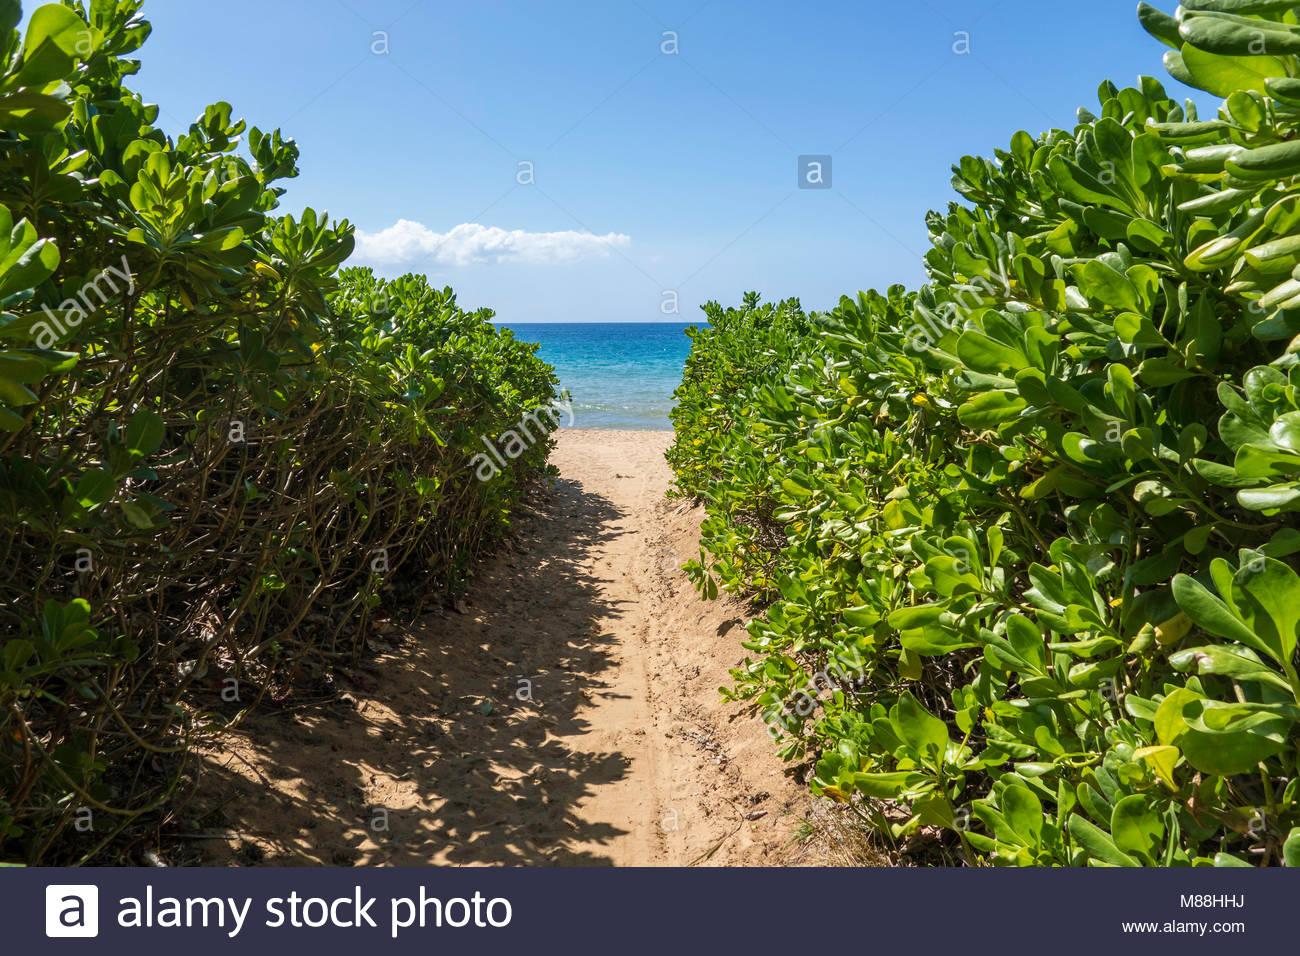 Designated public access to Keawakapu Beach on the island of Maui all beaches are public in the State of Hawaii - Stock Image